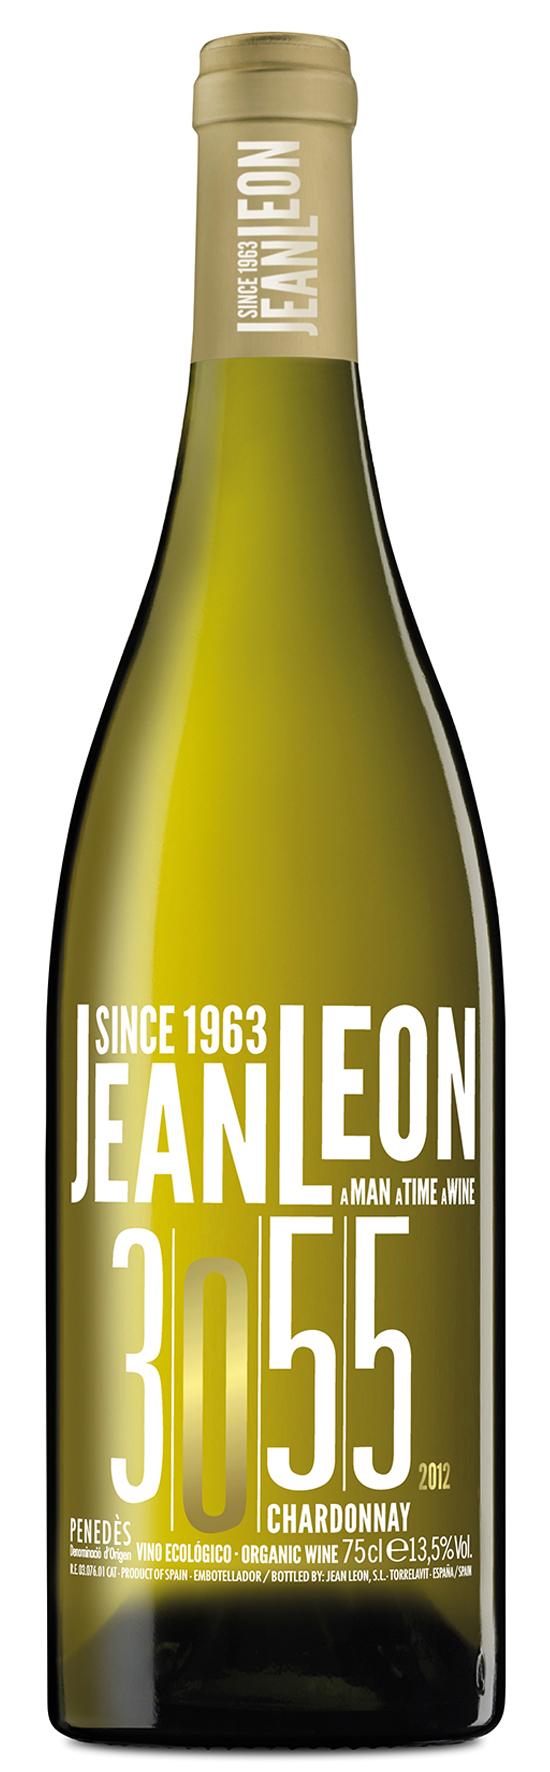 "2016 Jean Leon ""3055"" Chardonnay"